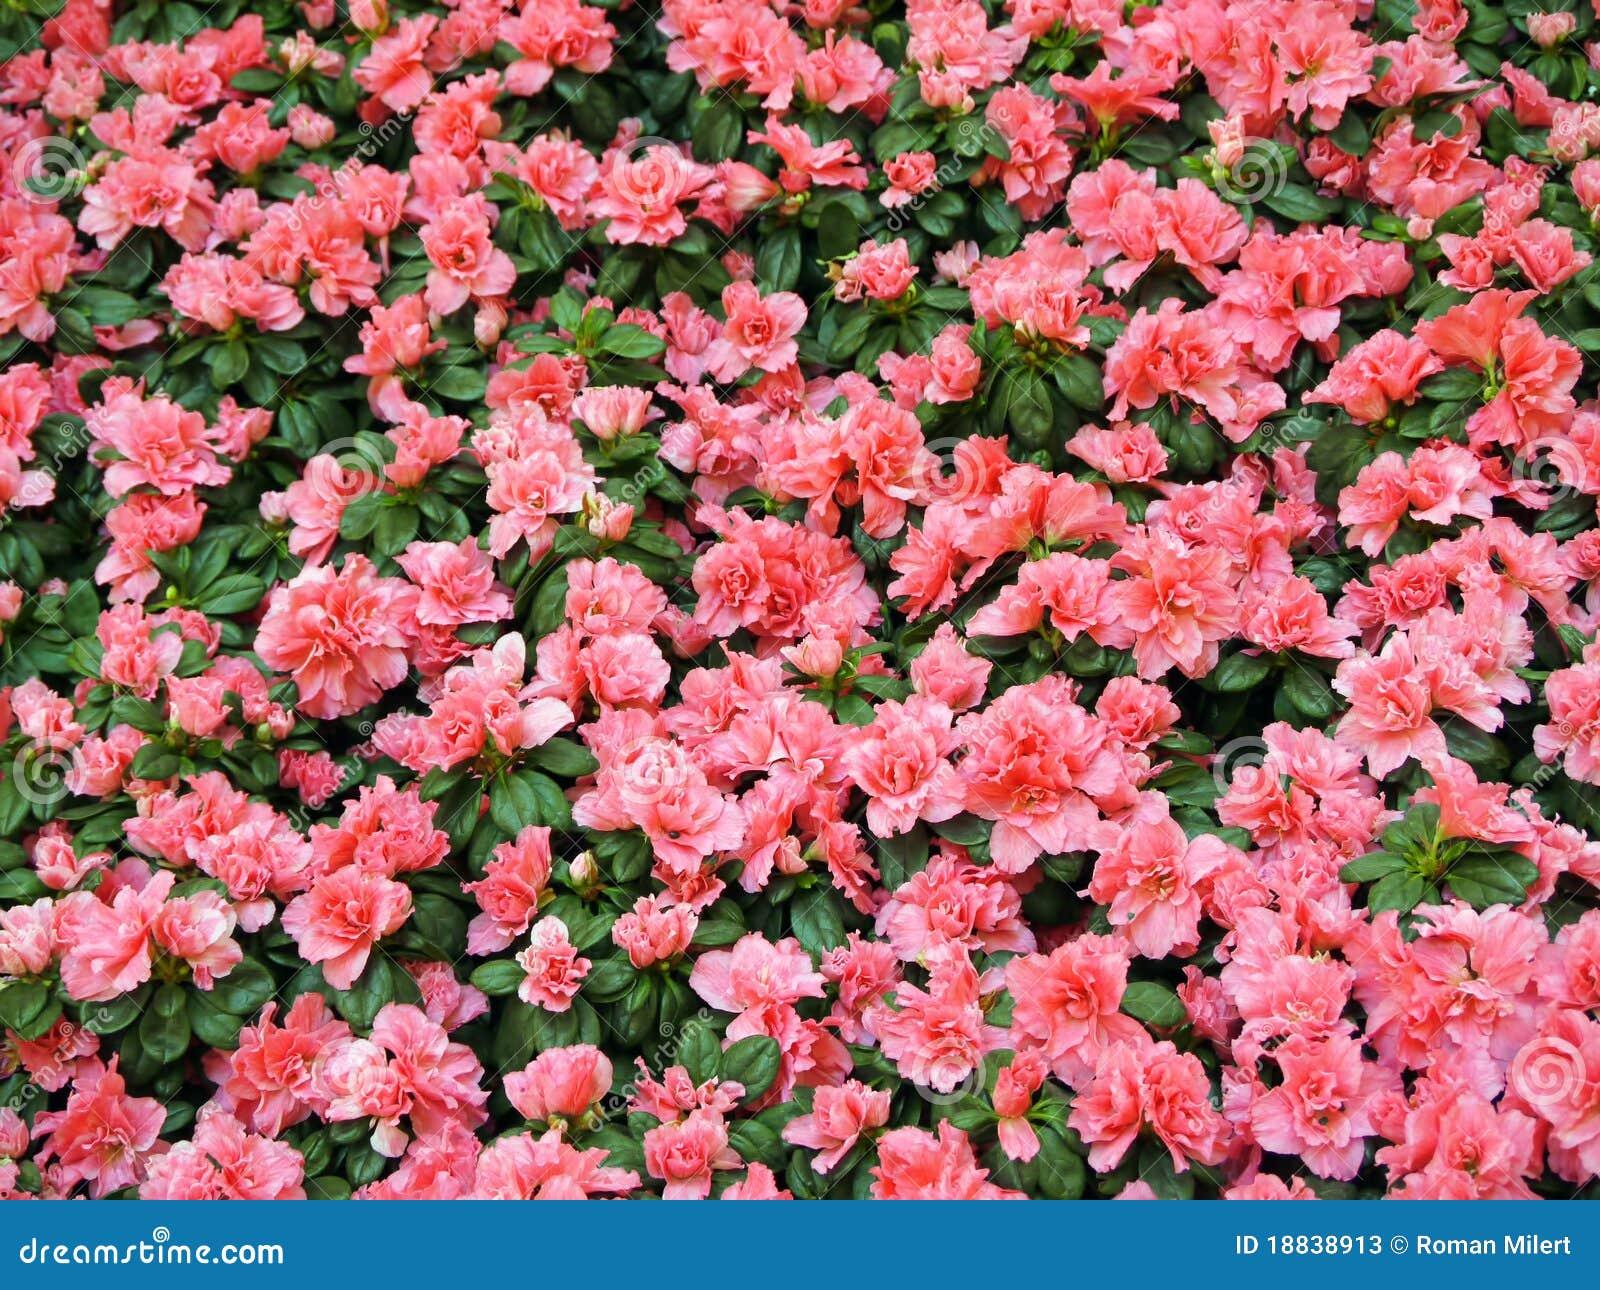 ... nature gardening flower plant spring plants japanese bloom garden grow